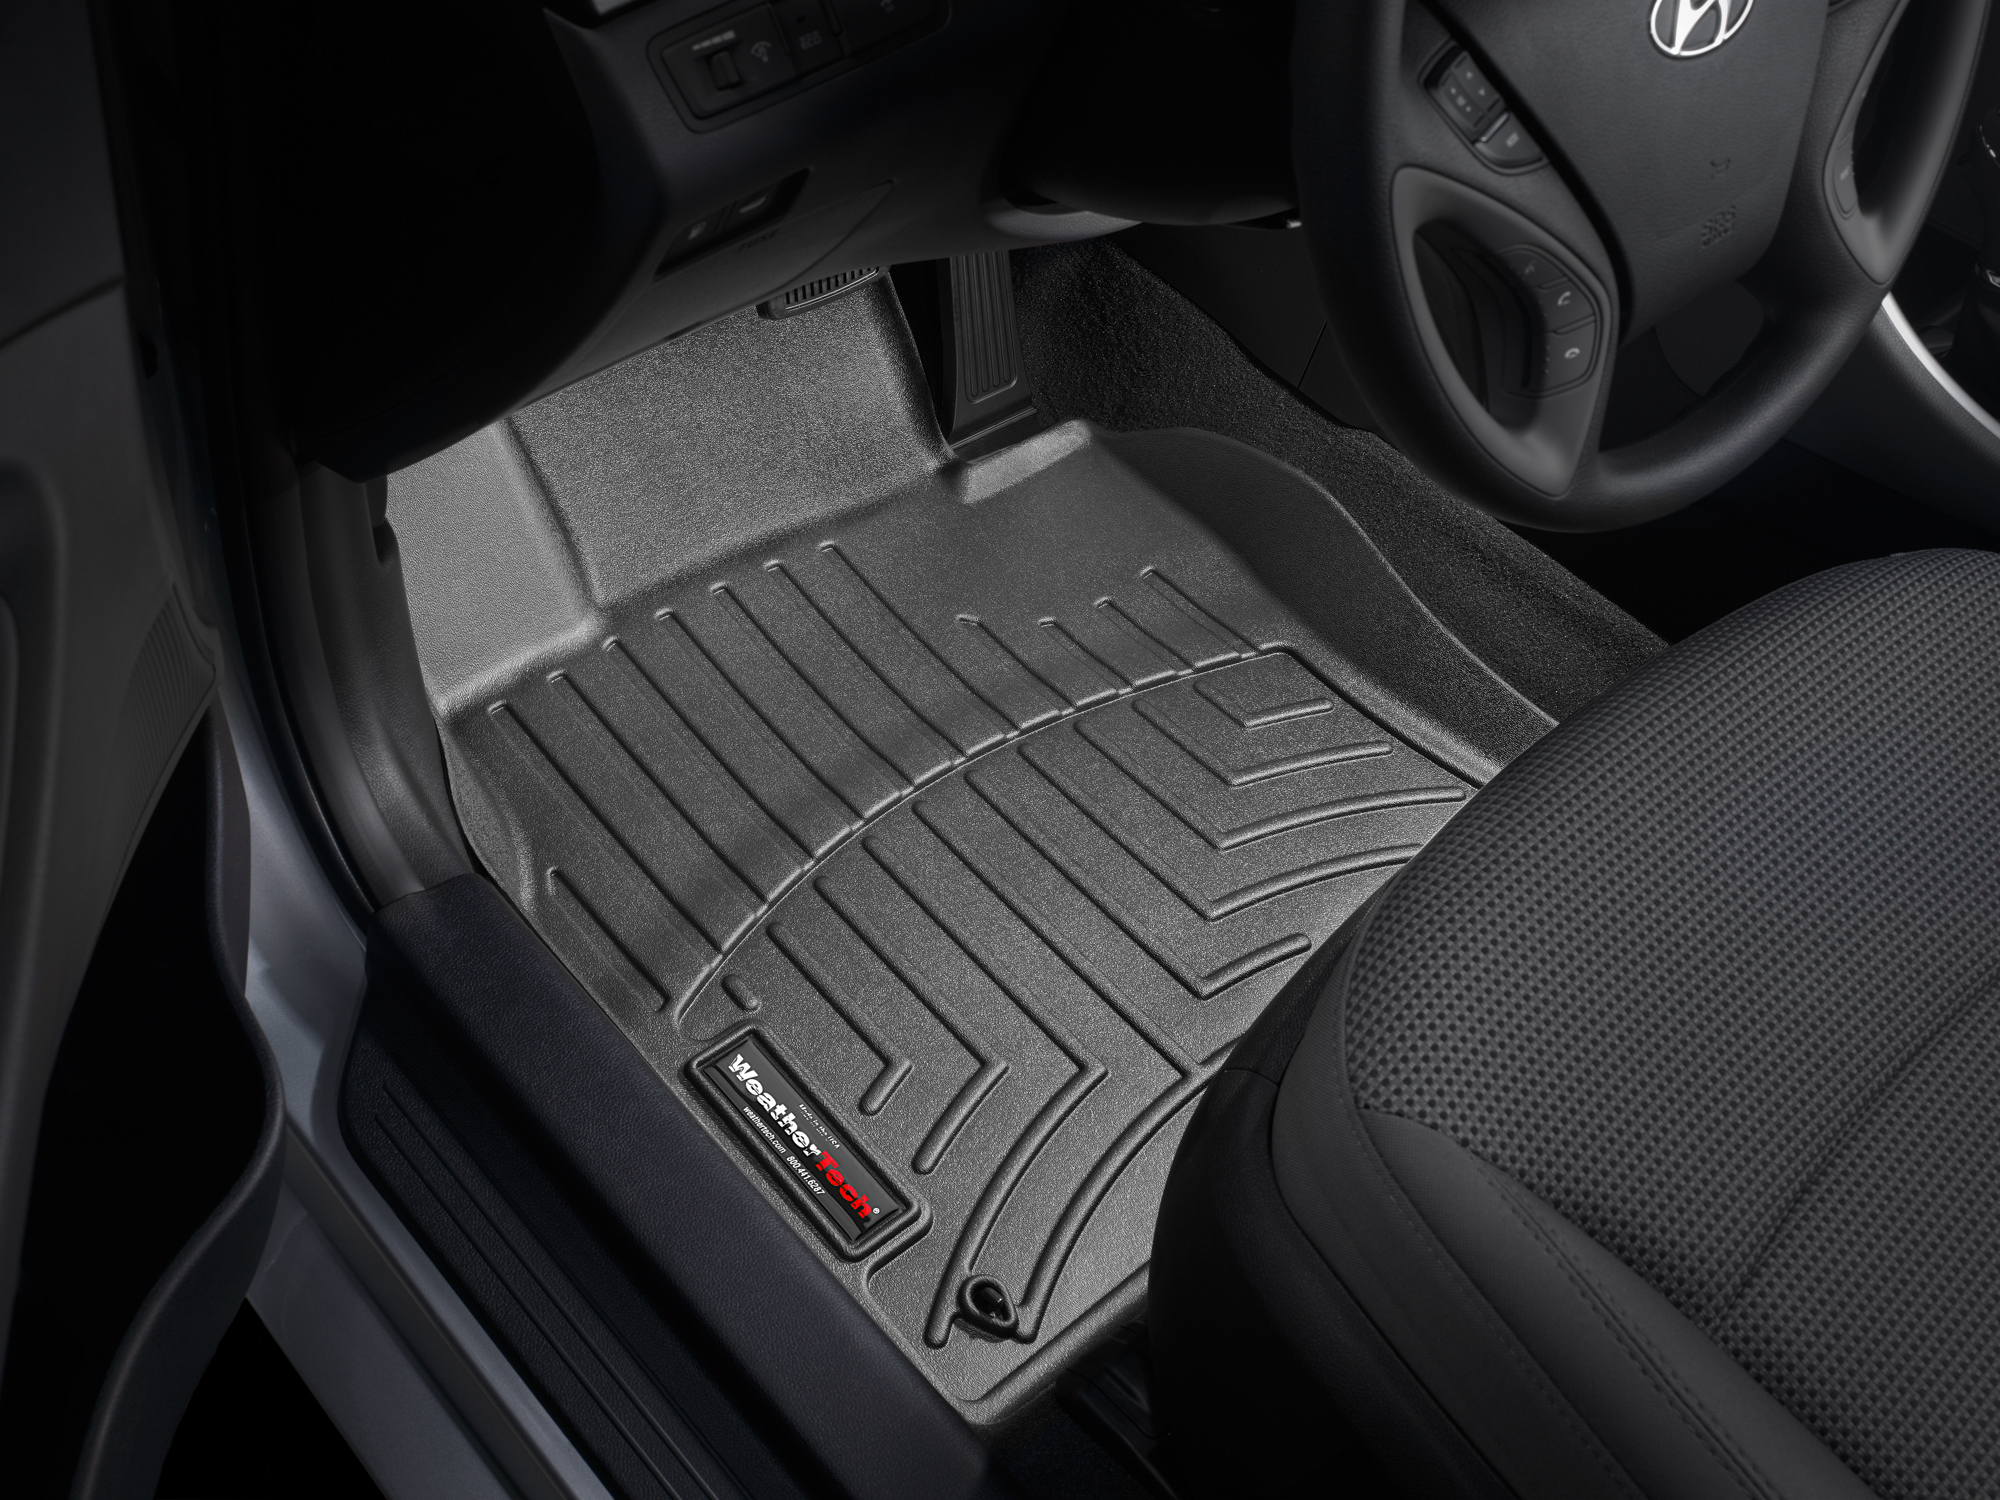 Exceptional 2013 Hyundai Sonata | All Weather Car Mats   All Season Flexible Rubber Floor  Mats | WeatherTech